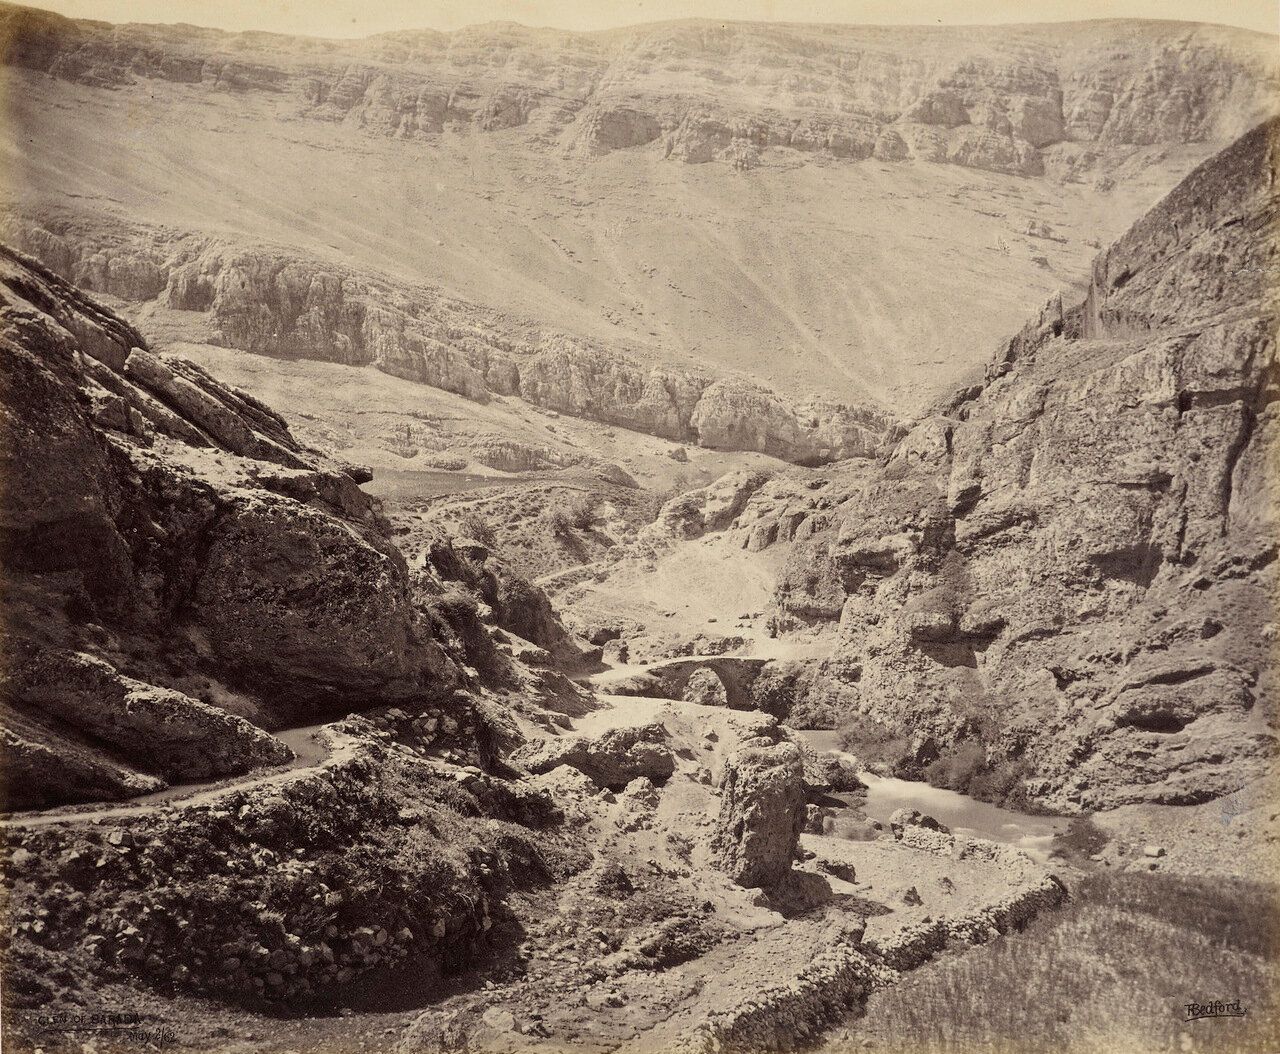 2 мая 1862. Долина реки Барада. Сирия